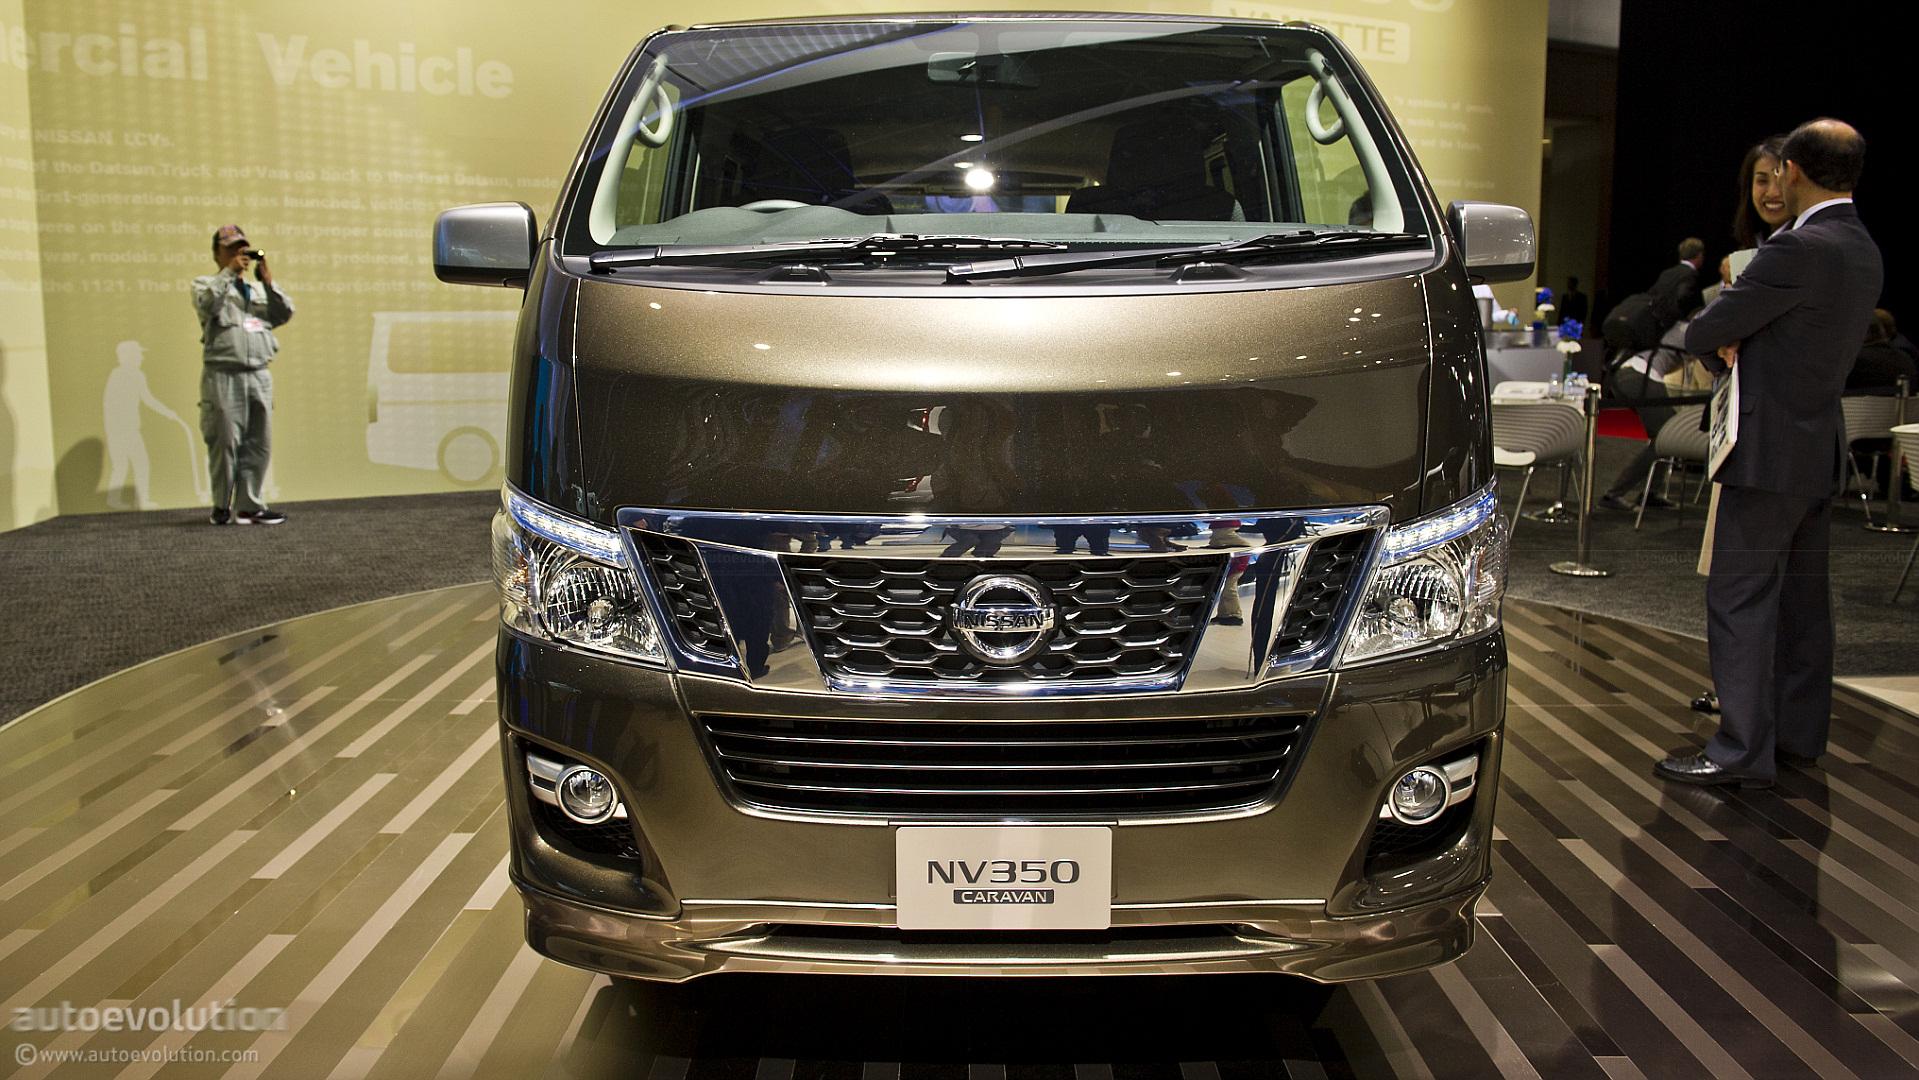 Nissan Nv Passenger Van >> Tokyo 2011: Nissan NV350 Caravan [Live Photos] - autoevolution